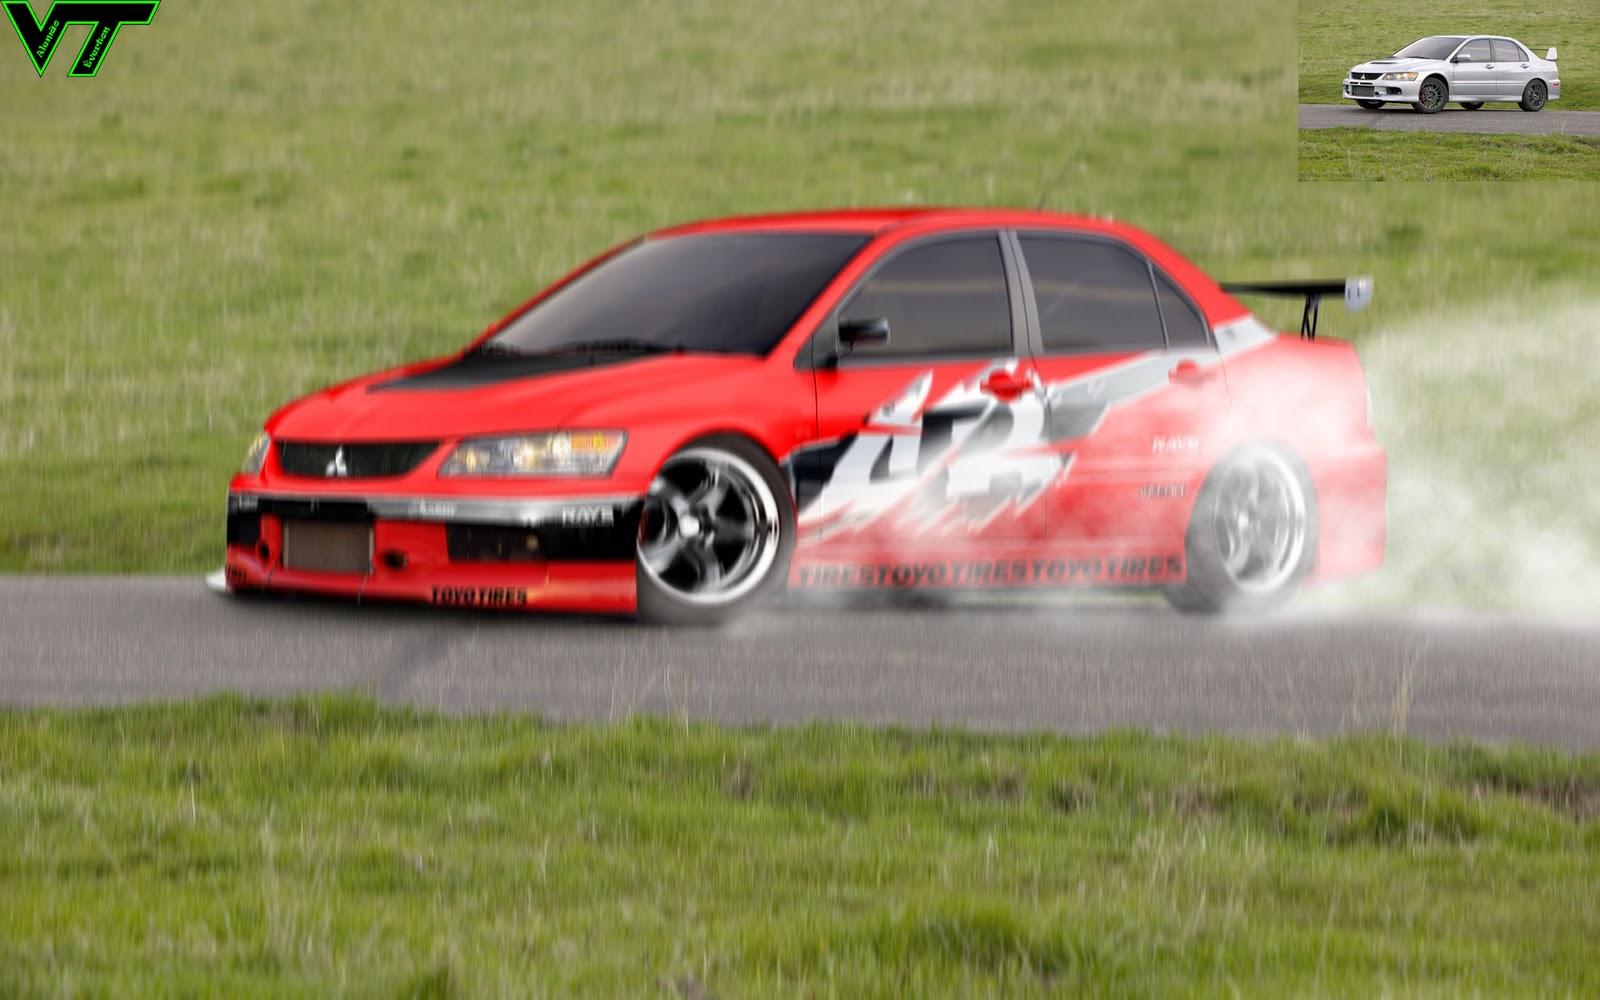 http://1.bp.blogspot.com/_bF4WMCDZT7A/TNZ9FjaOFtI/AAAAAAAAAGg/--uGpVeHg9k/s1600/Mitsubishi+Lancer+EVO+IX+MR2.jpg